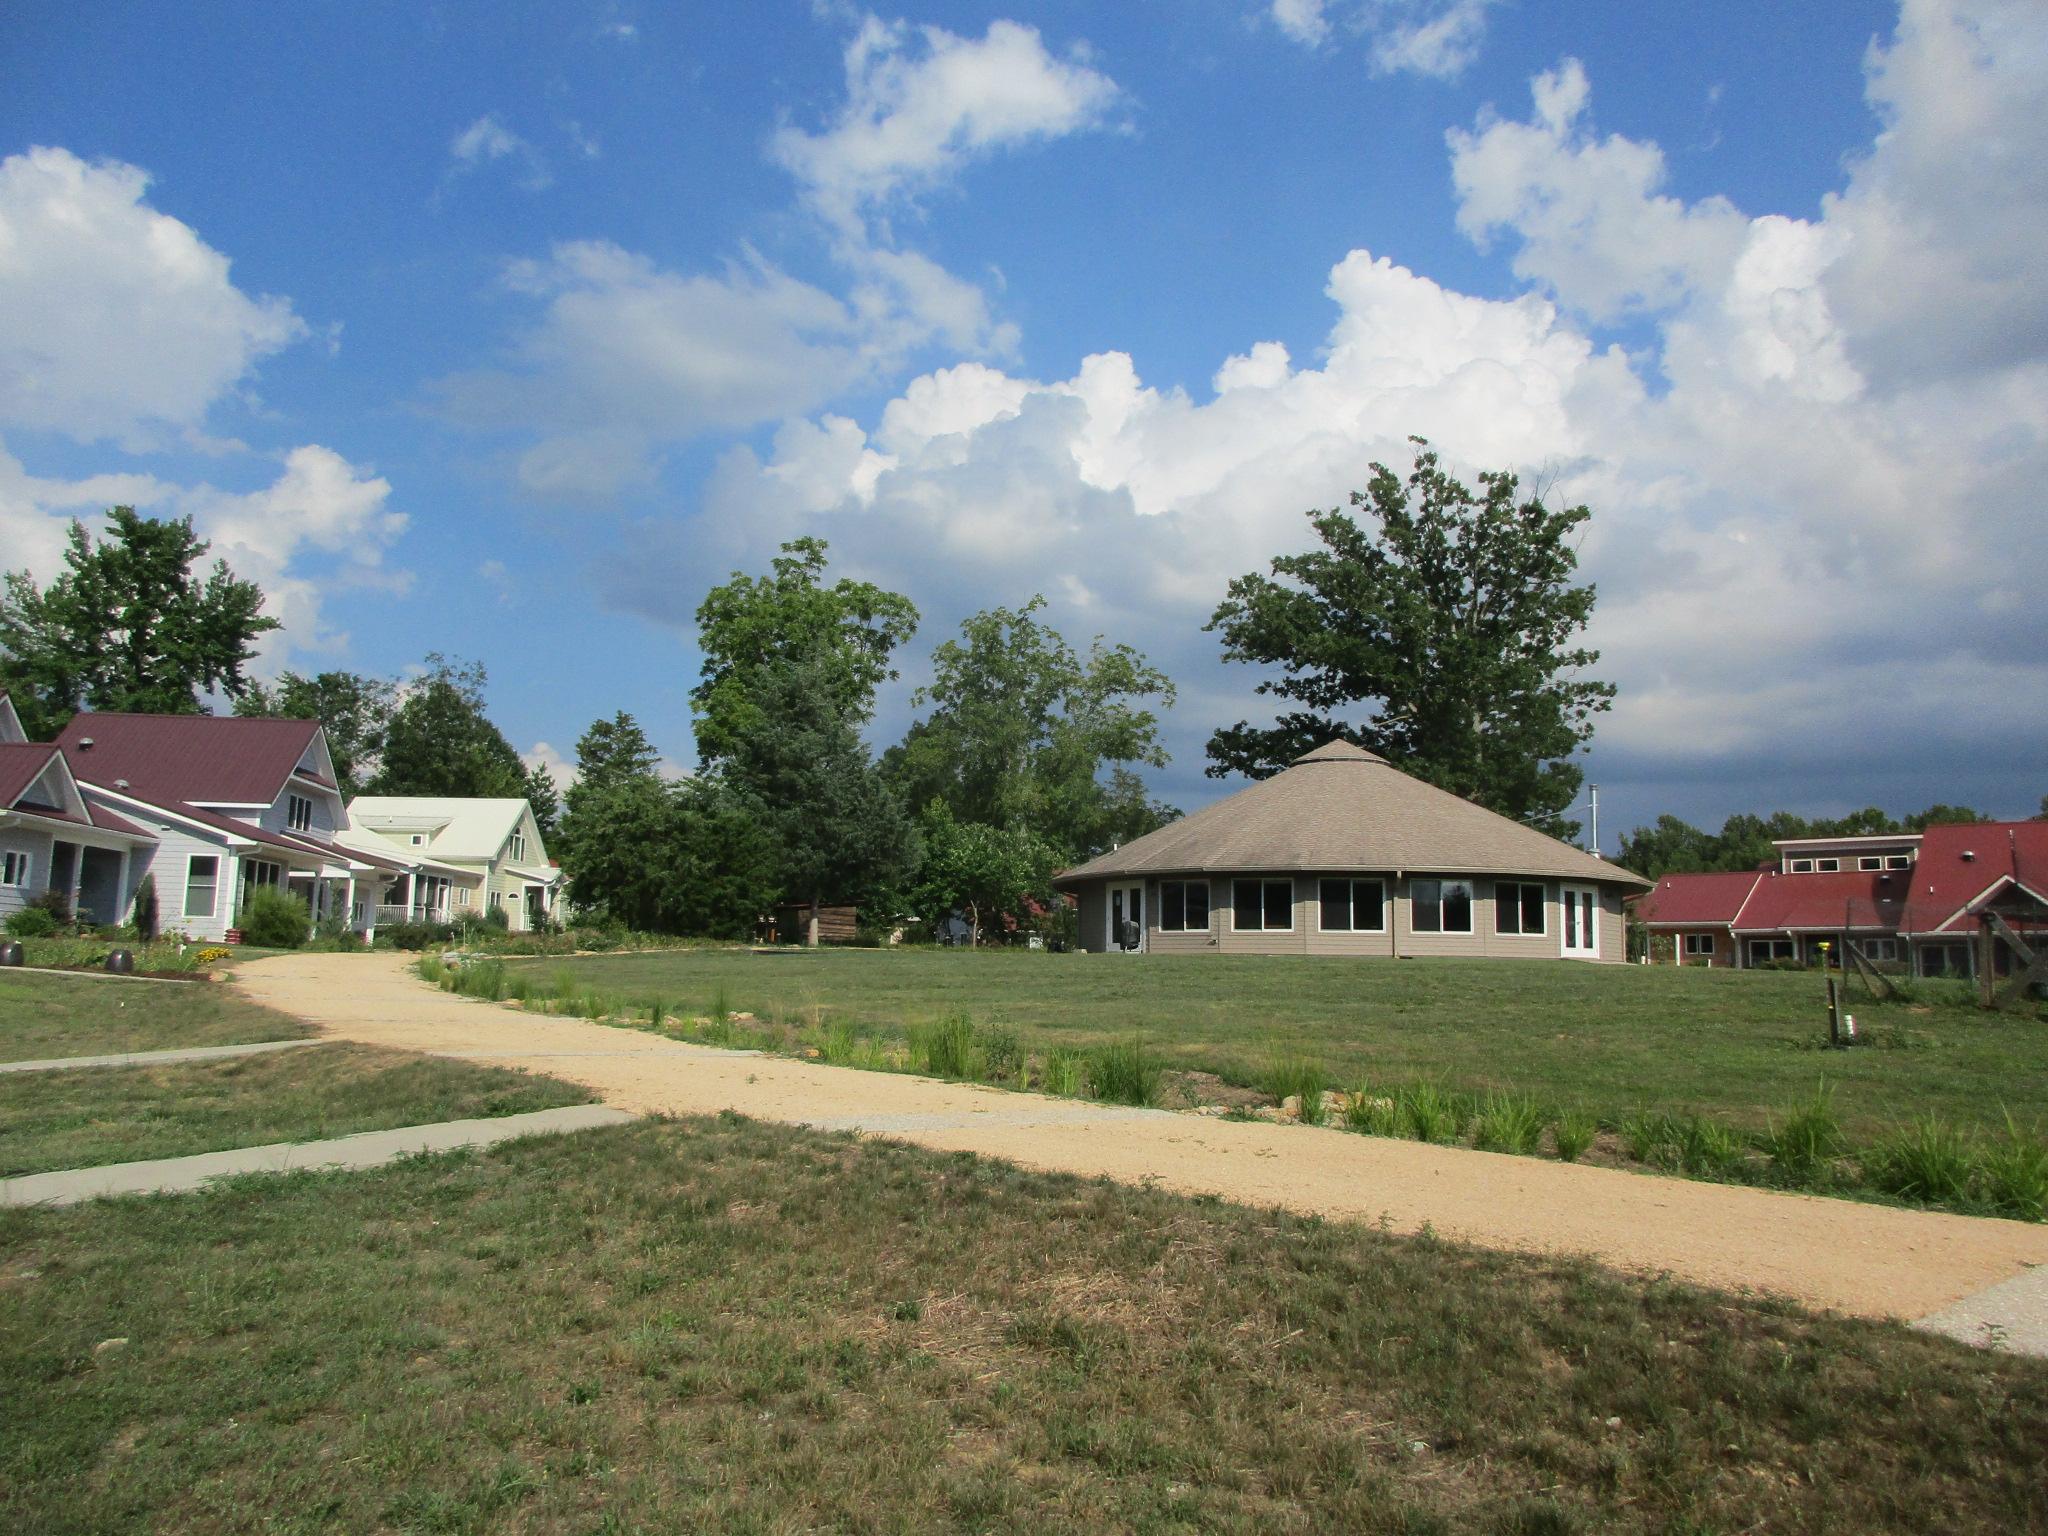 Elderberry\'s homes surround the common house.